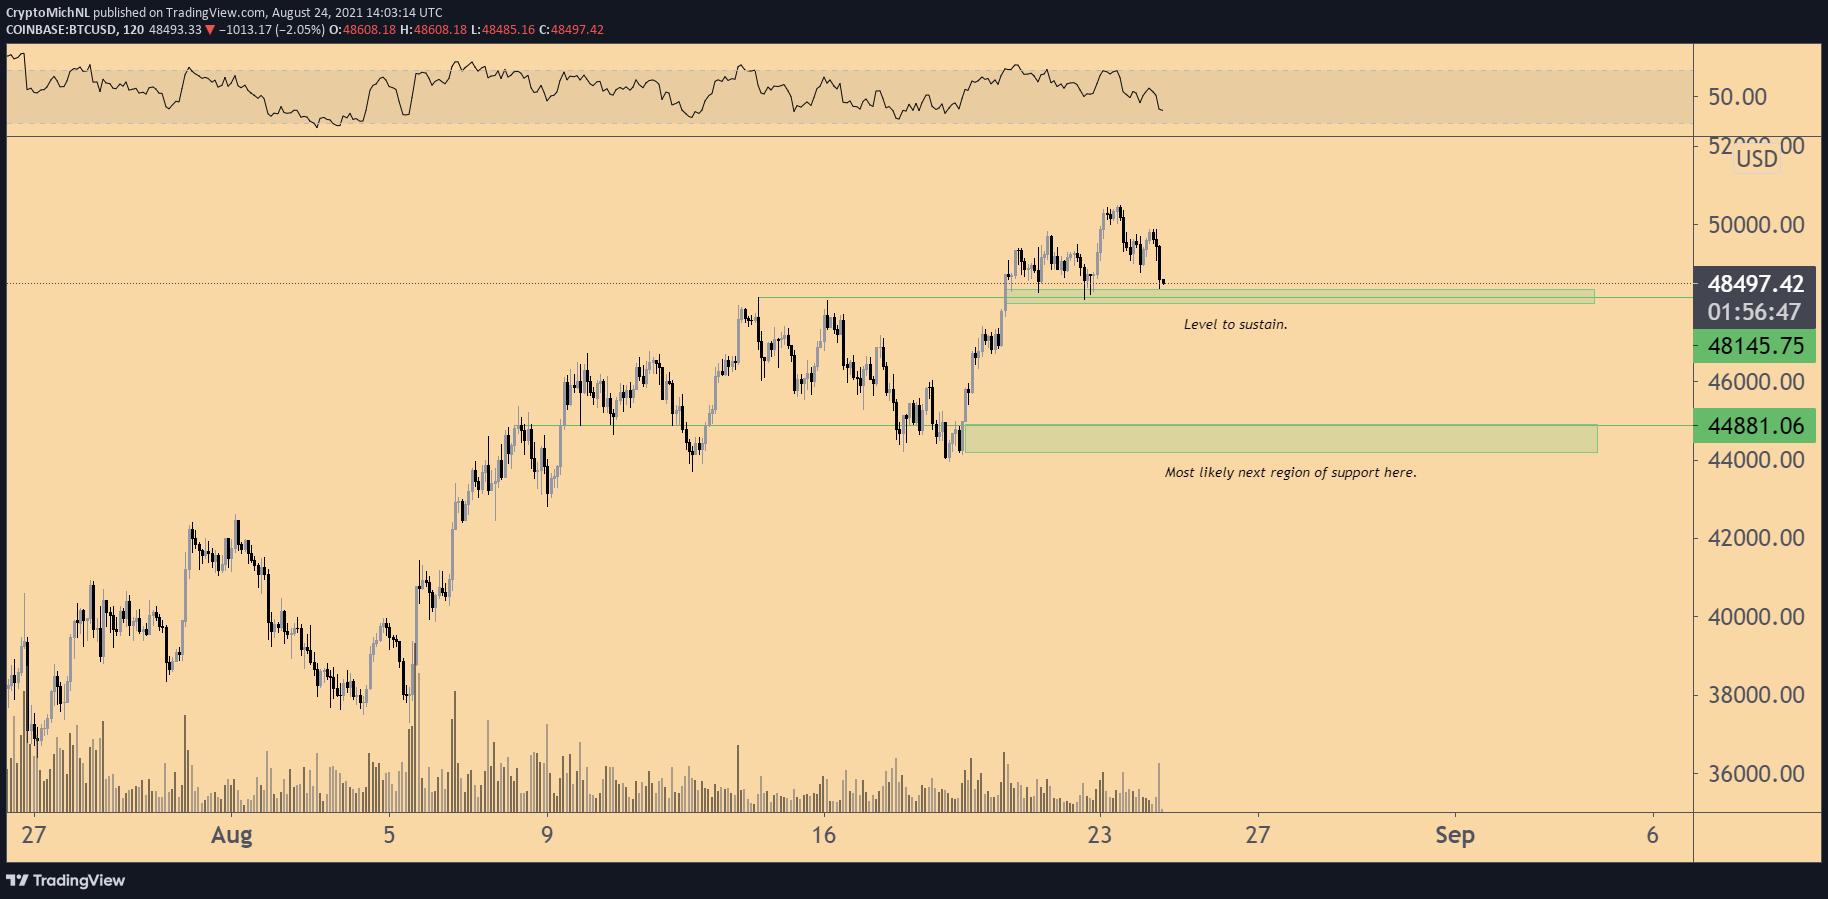 BTC/USD 2-hour chart. Source: TradingView